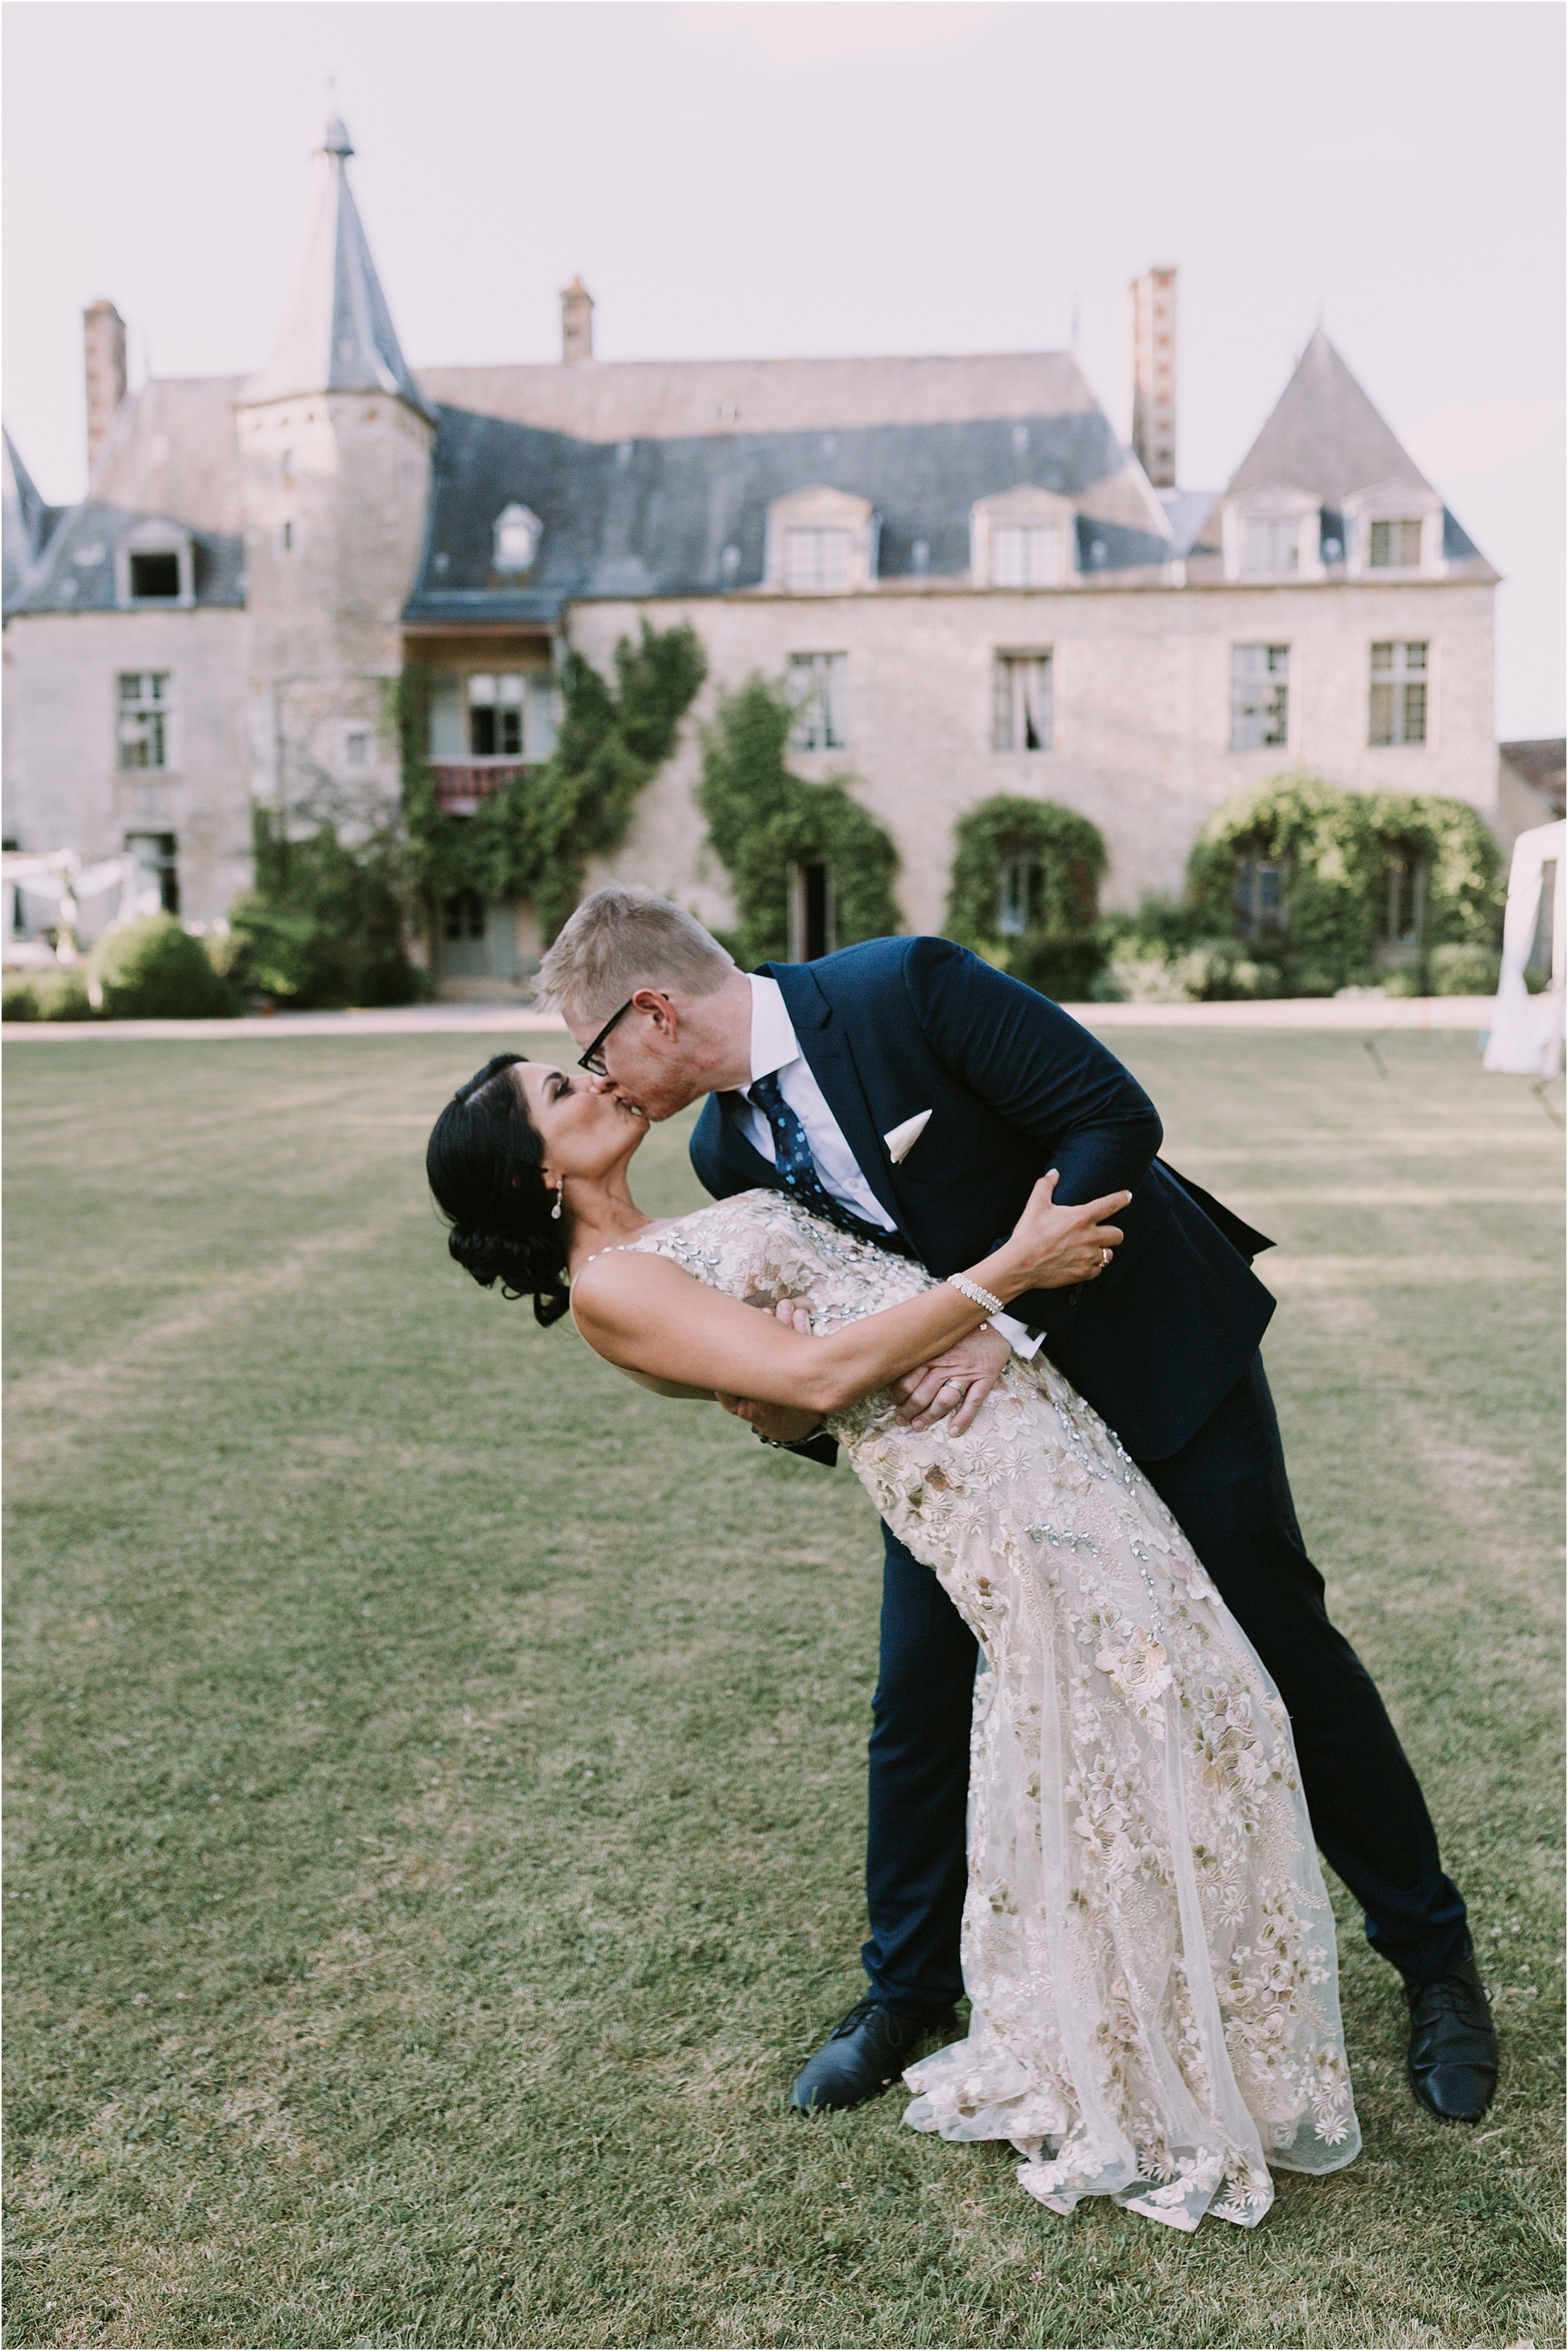 Kateryna-photos-photographe-mariage-chateau-st-paterne-mayenne-normandie_0180.jpg